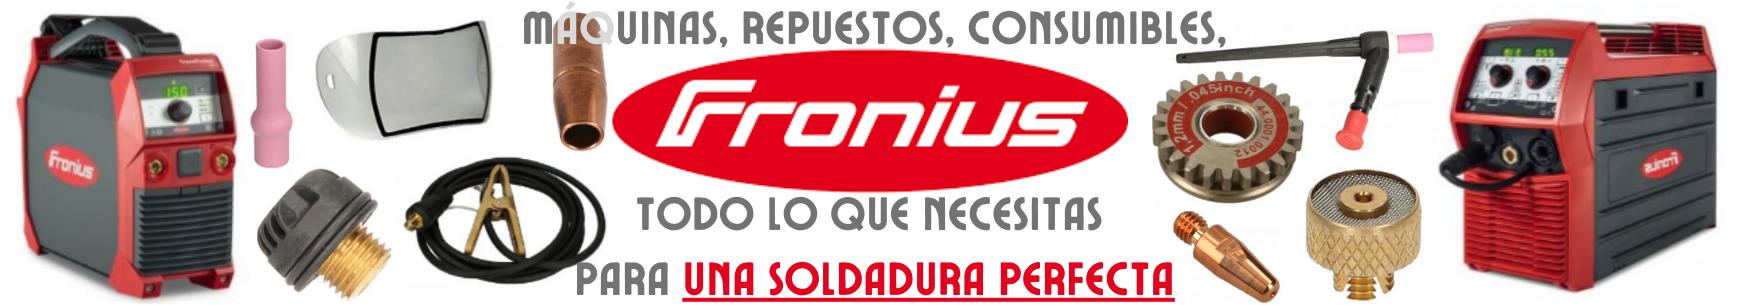 distribuidores-soldadura-fronius